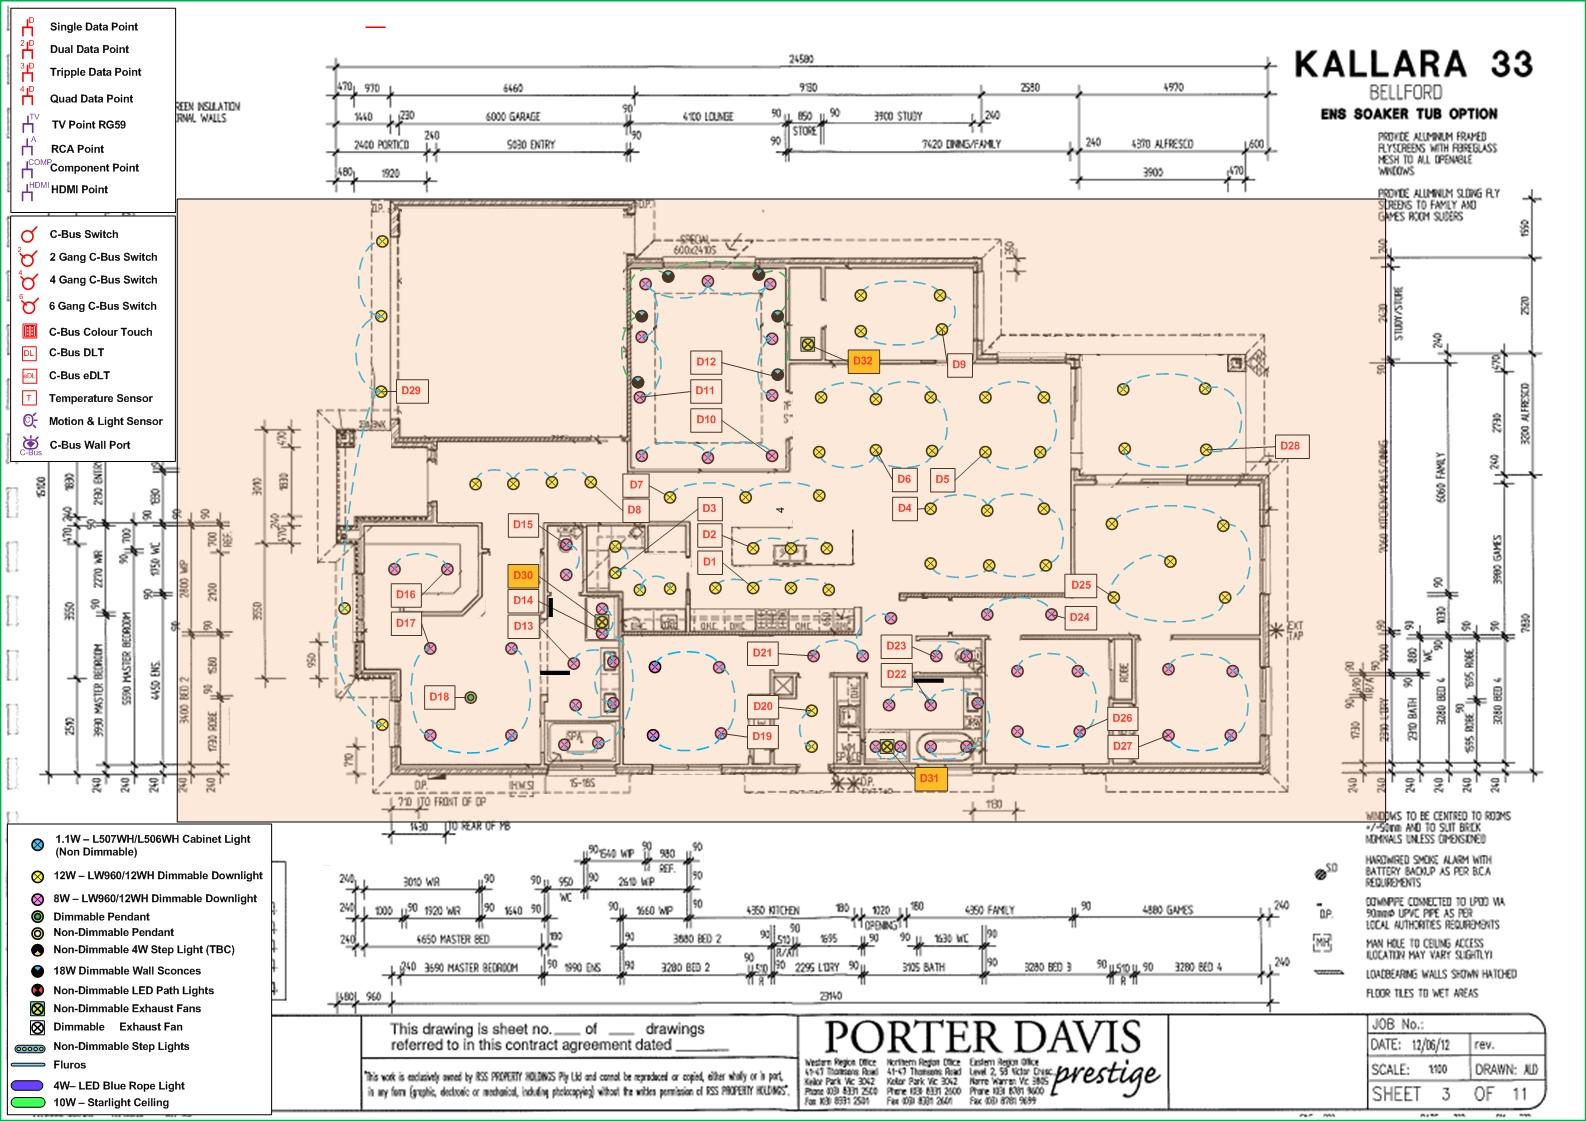 Kallara 33  Cbus  Data Points     Home       Theater     AV